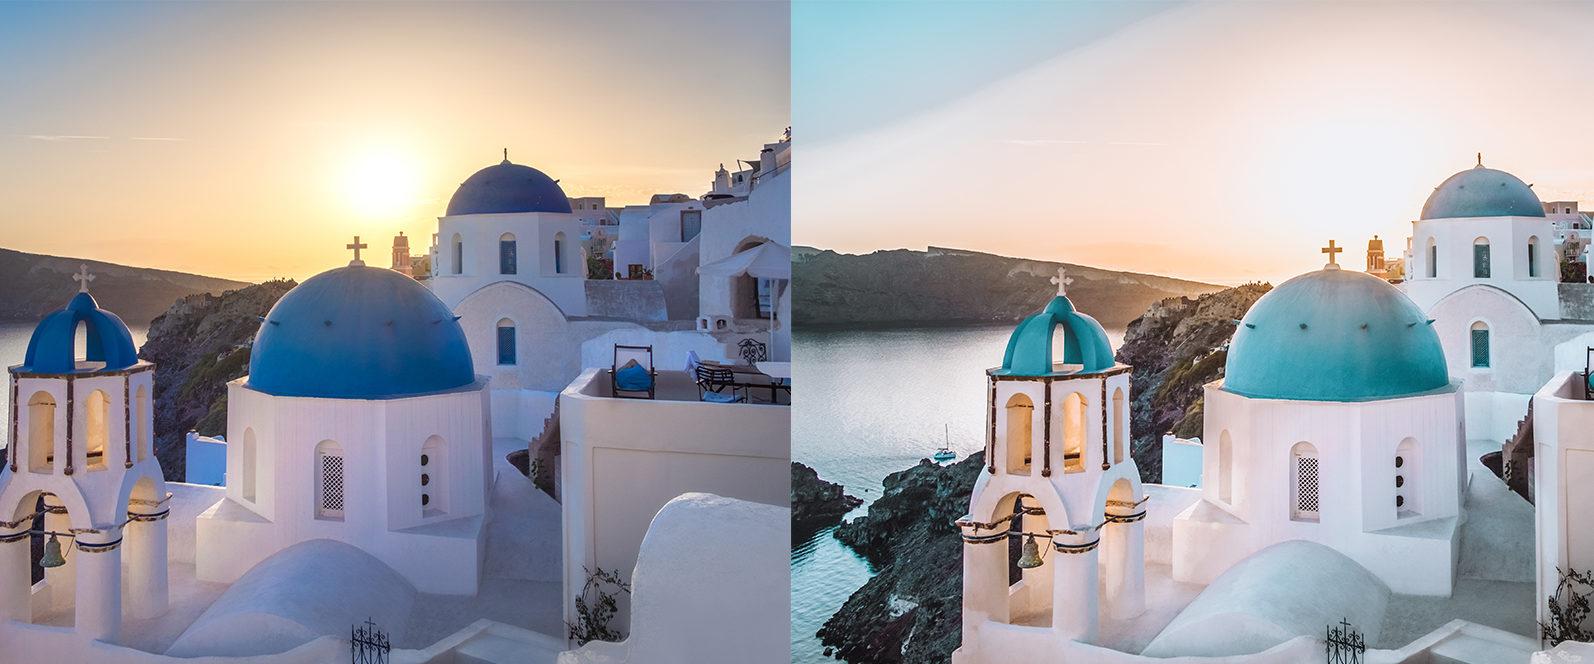 14 x Greece Lightroom Presets   Mobile and Desktop - 2 Greece 1 -